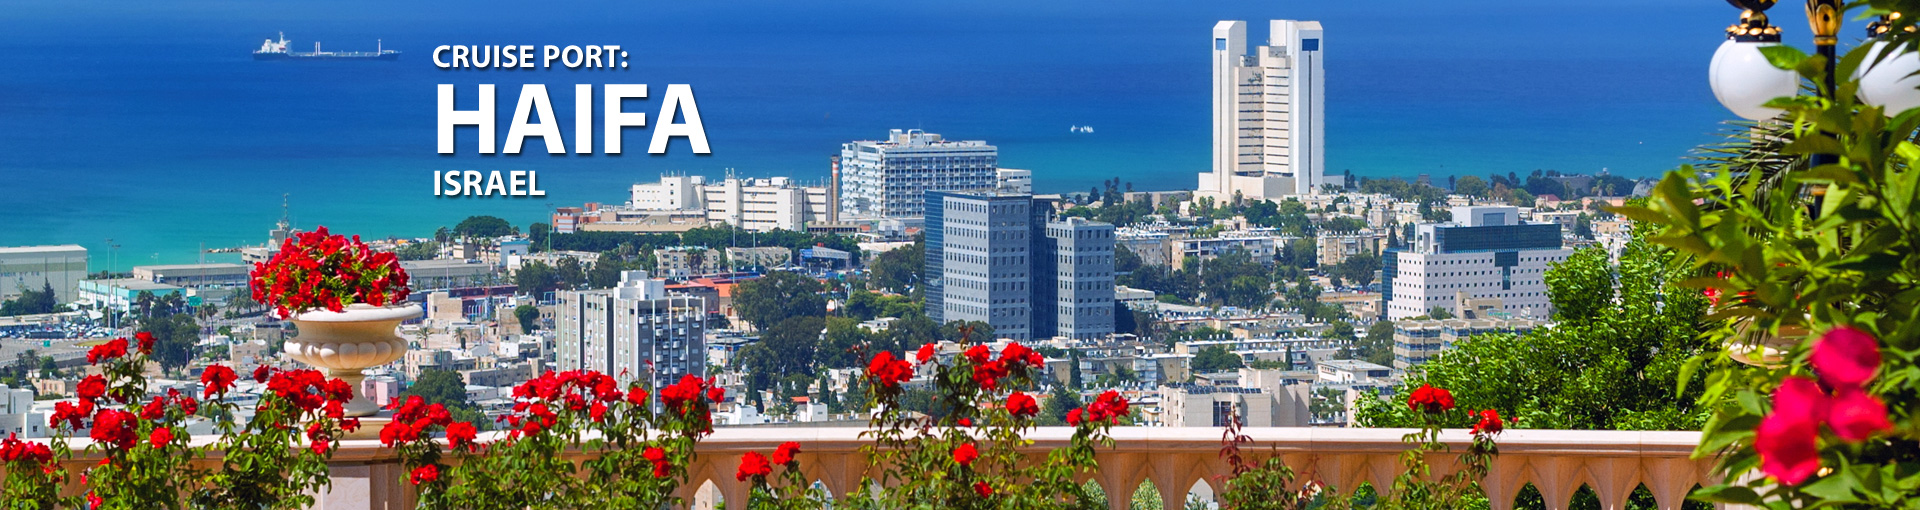 Cruises to Haifa, Israel